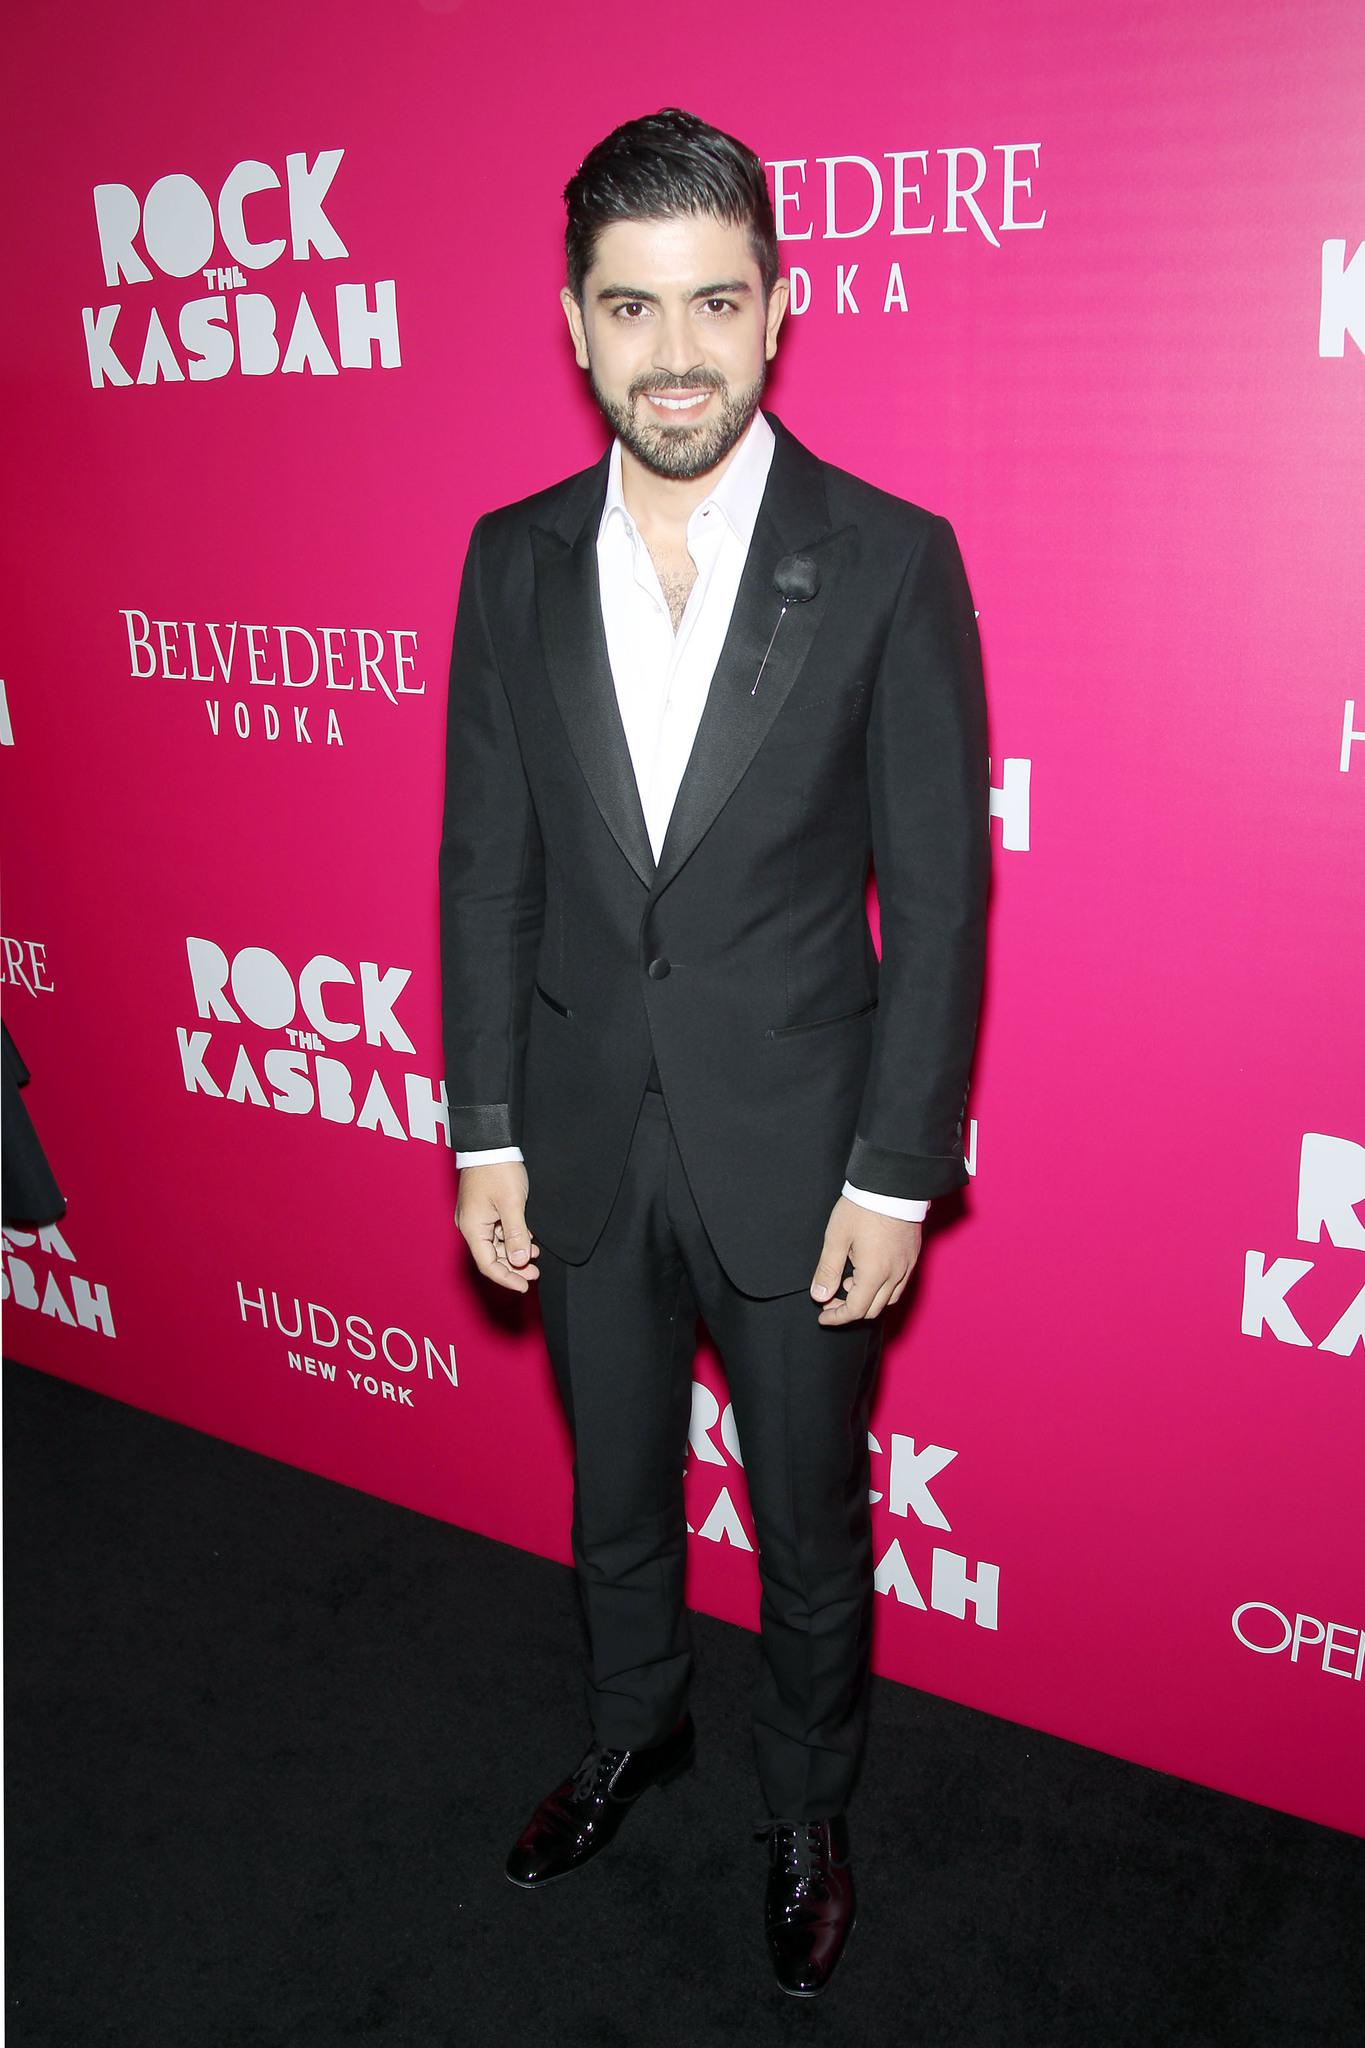 Beejan Land at event of Rock the Kasbah (2015)